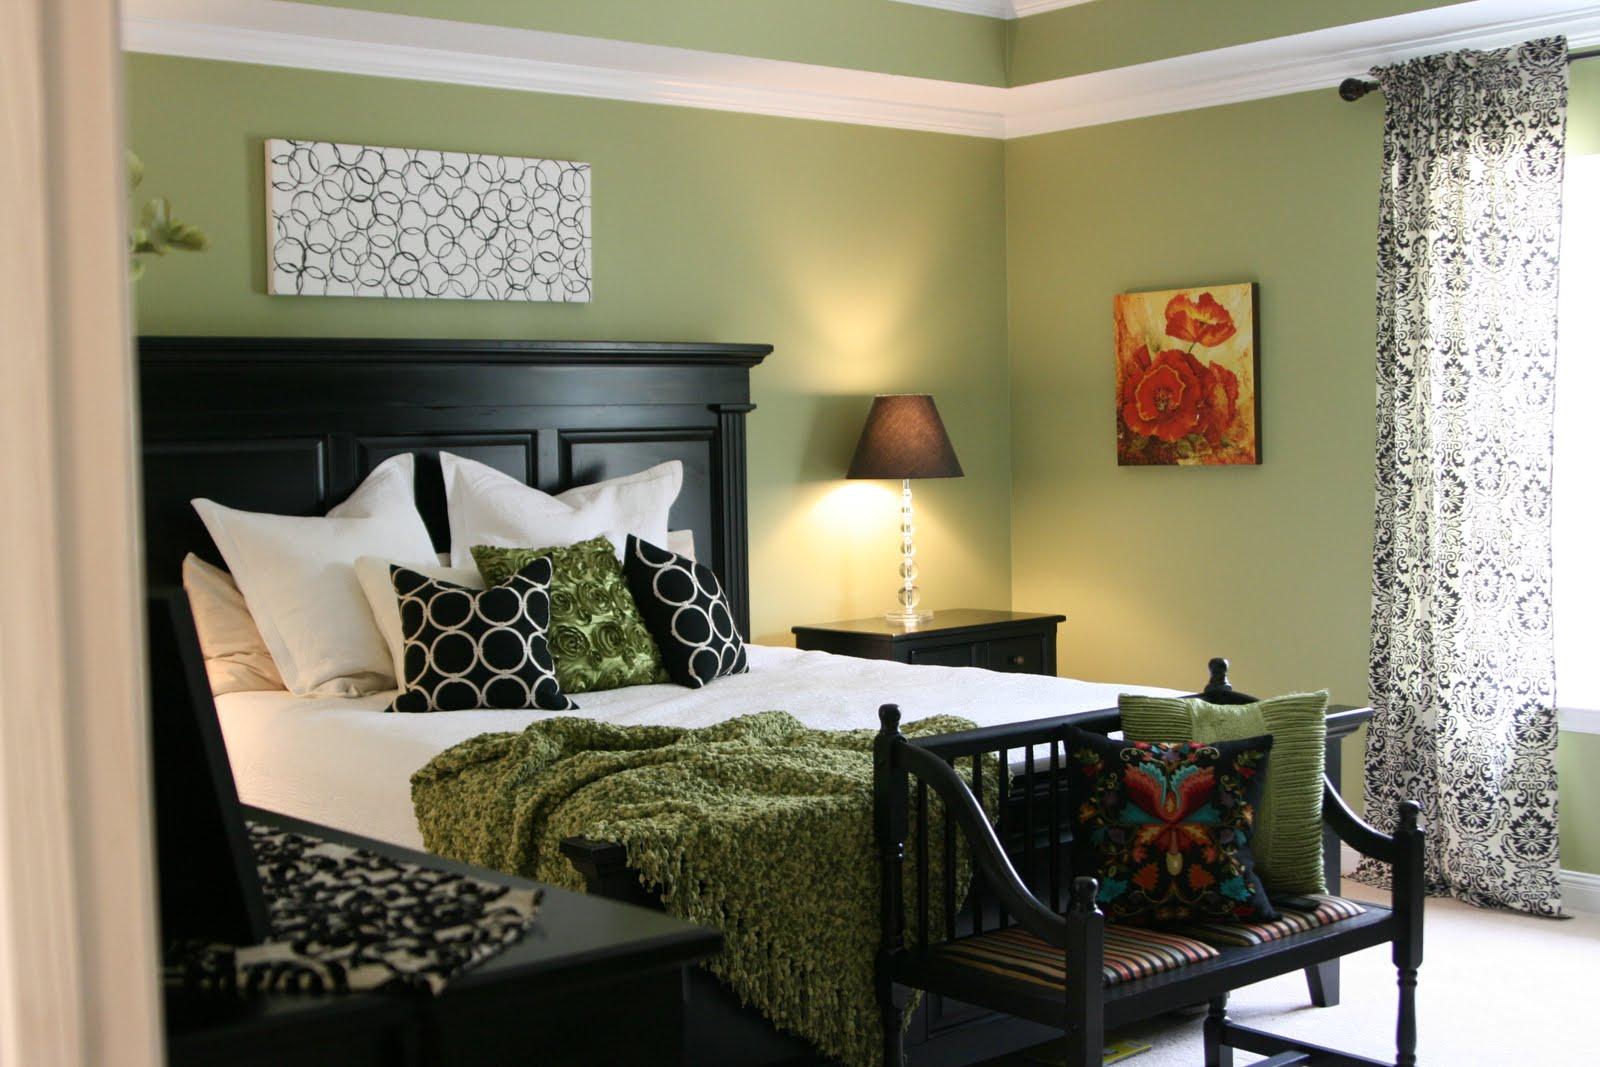 ryegrass favorite paint colors blog. Black Bedroom Furniture Sets. Home Design Ideas